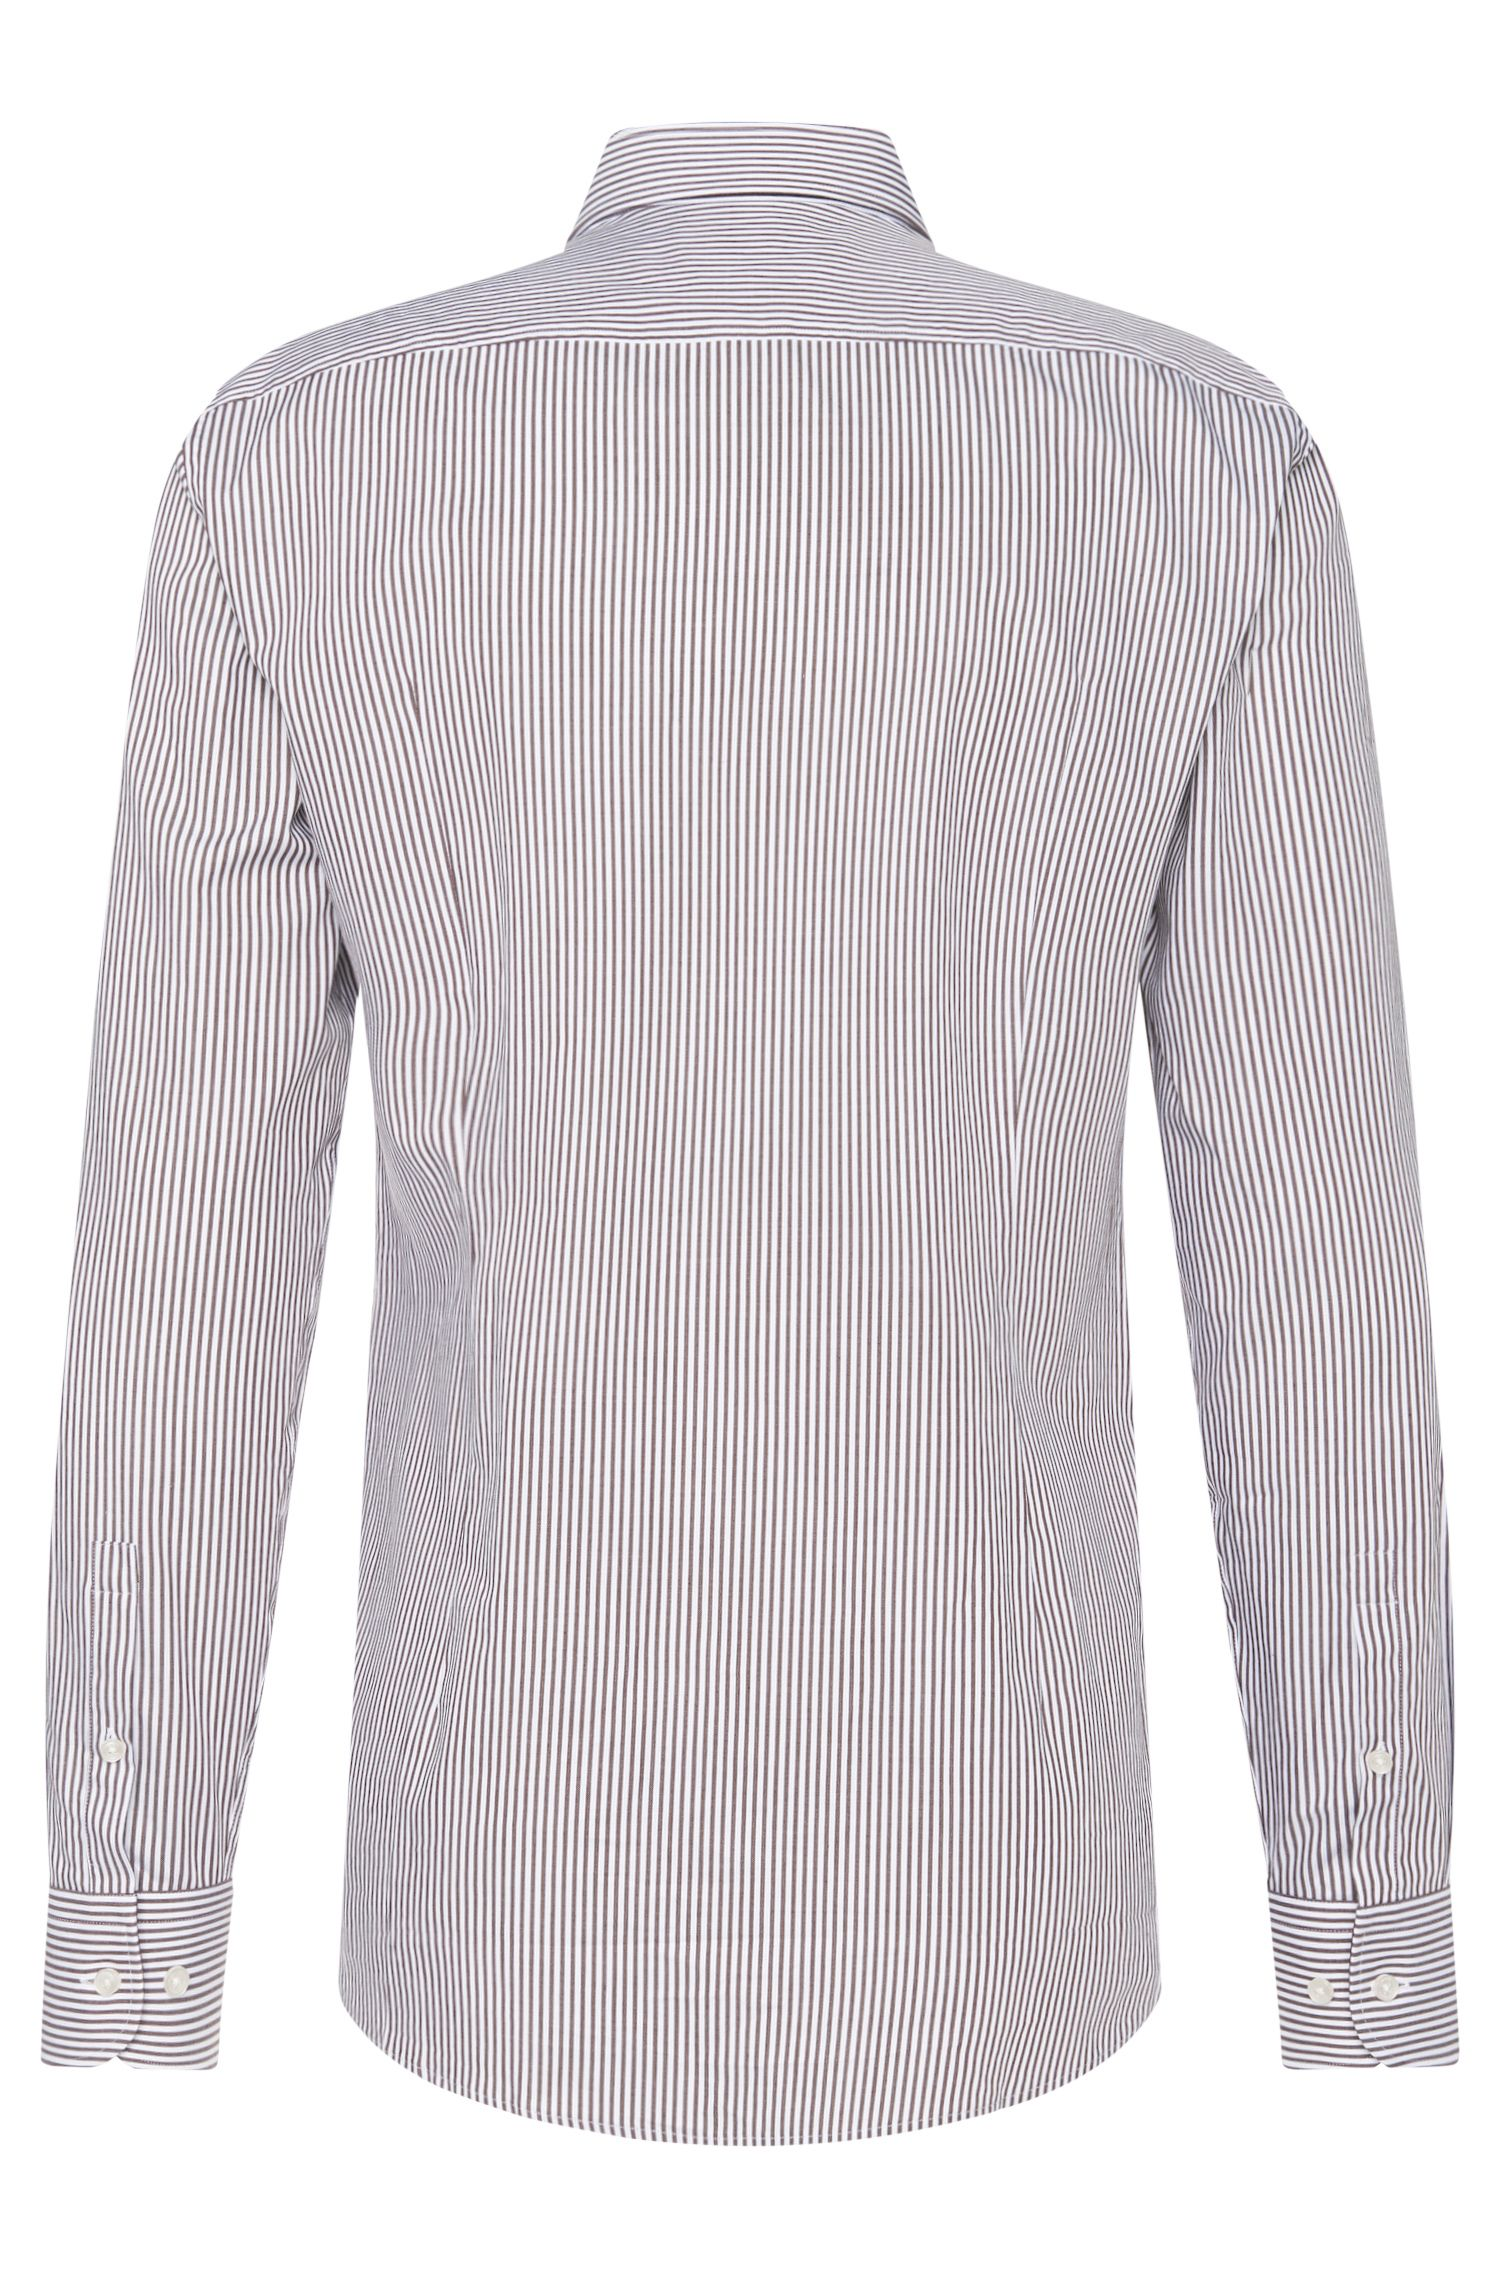 Gestreiftes Slim-Fit Hemd aus Baumwolle: 'Jery'